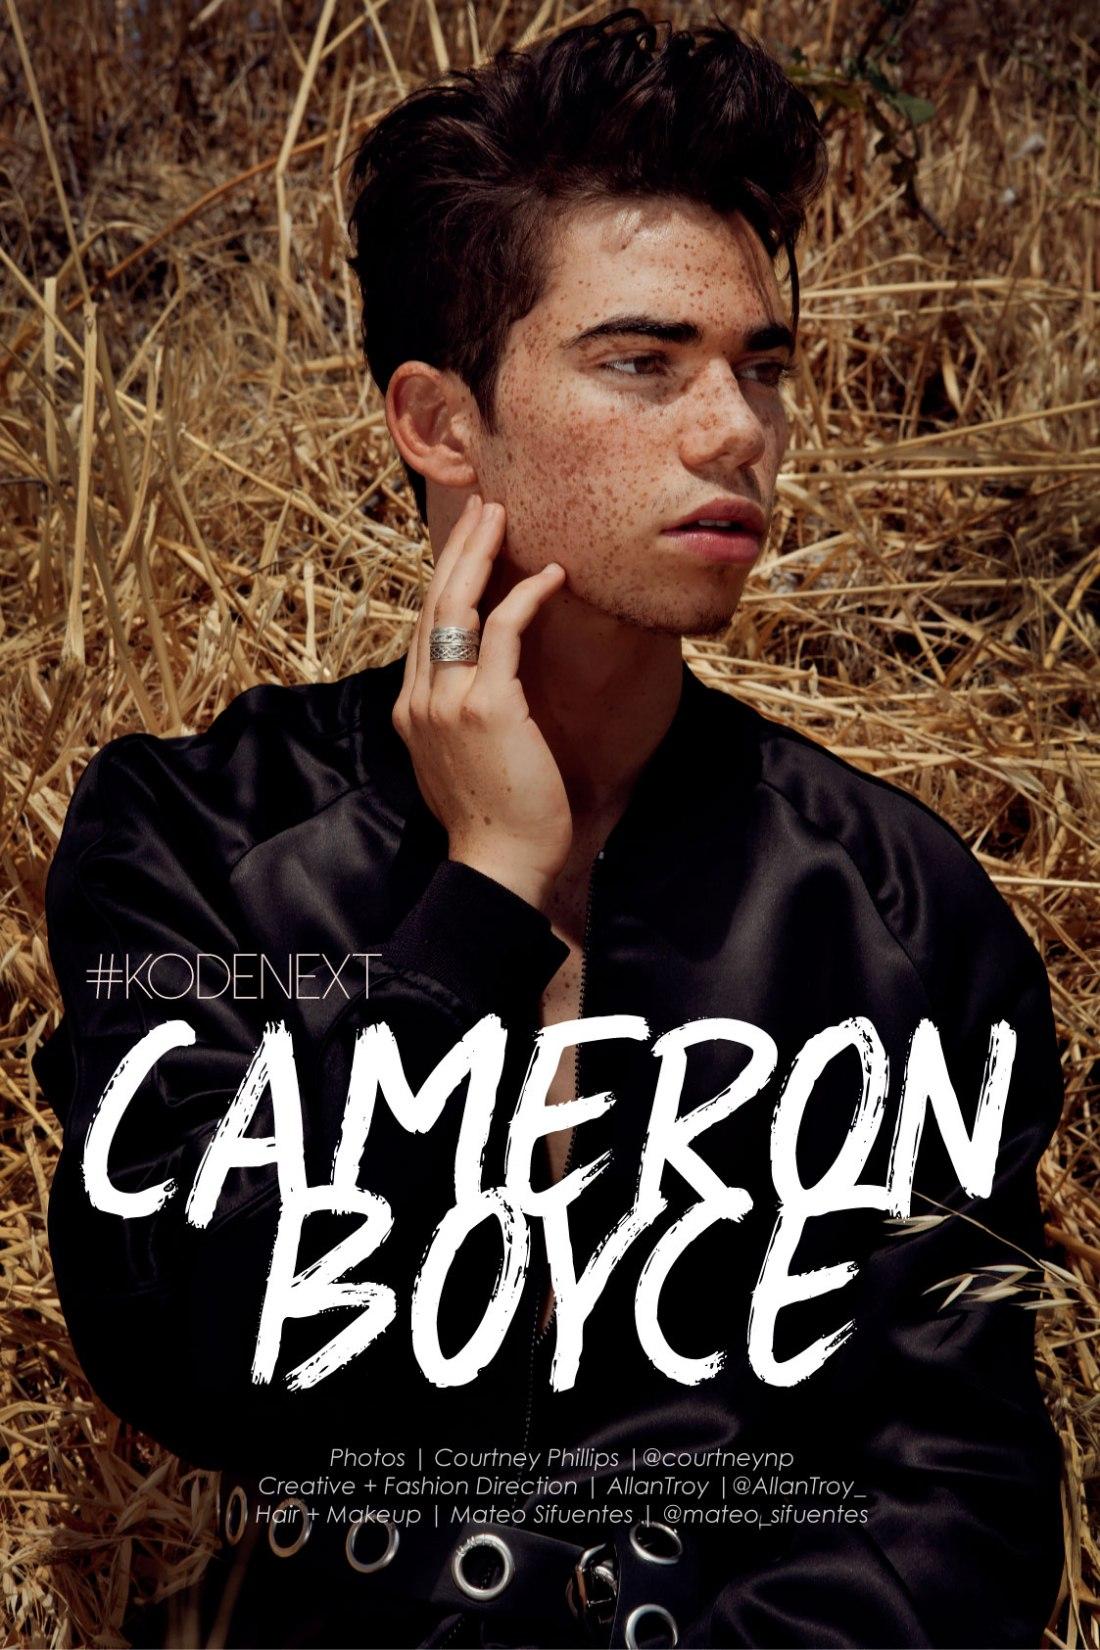 Cameron_Boyce_Opener_Kode_Mag.jpg